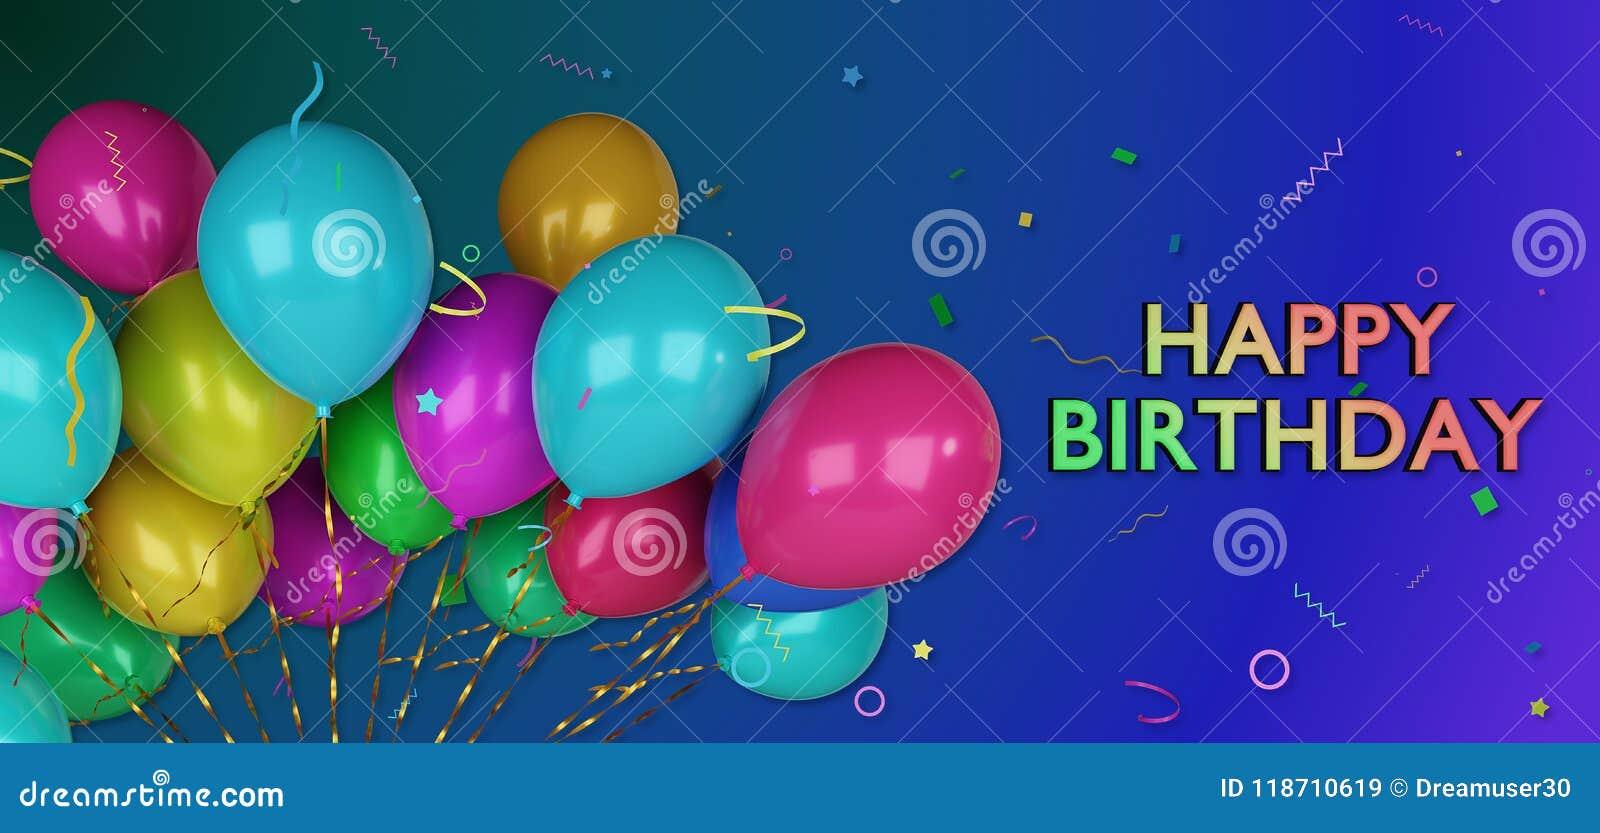 3d happy birthday greetings card stock illustration illustration 3d happy birthday greetings card m4hsunfo